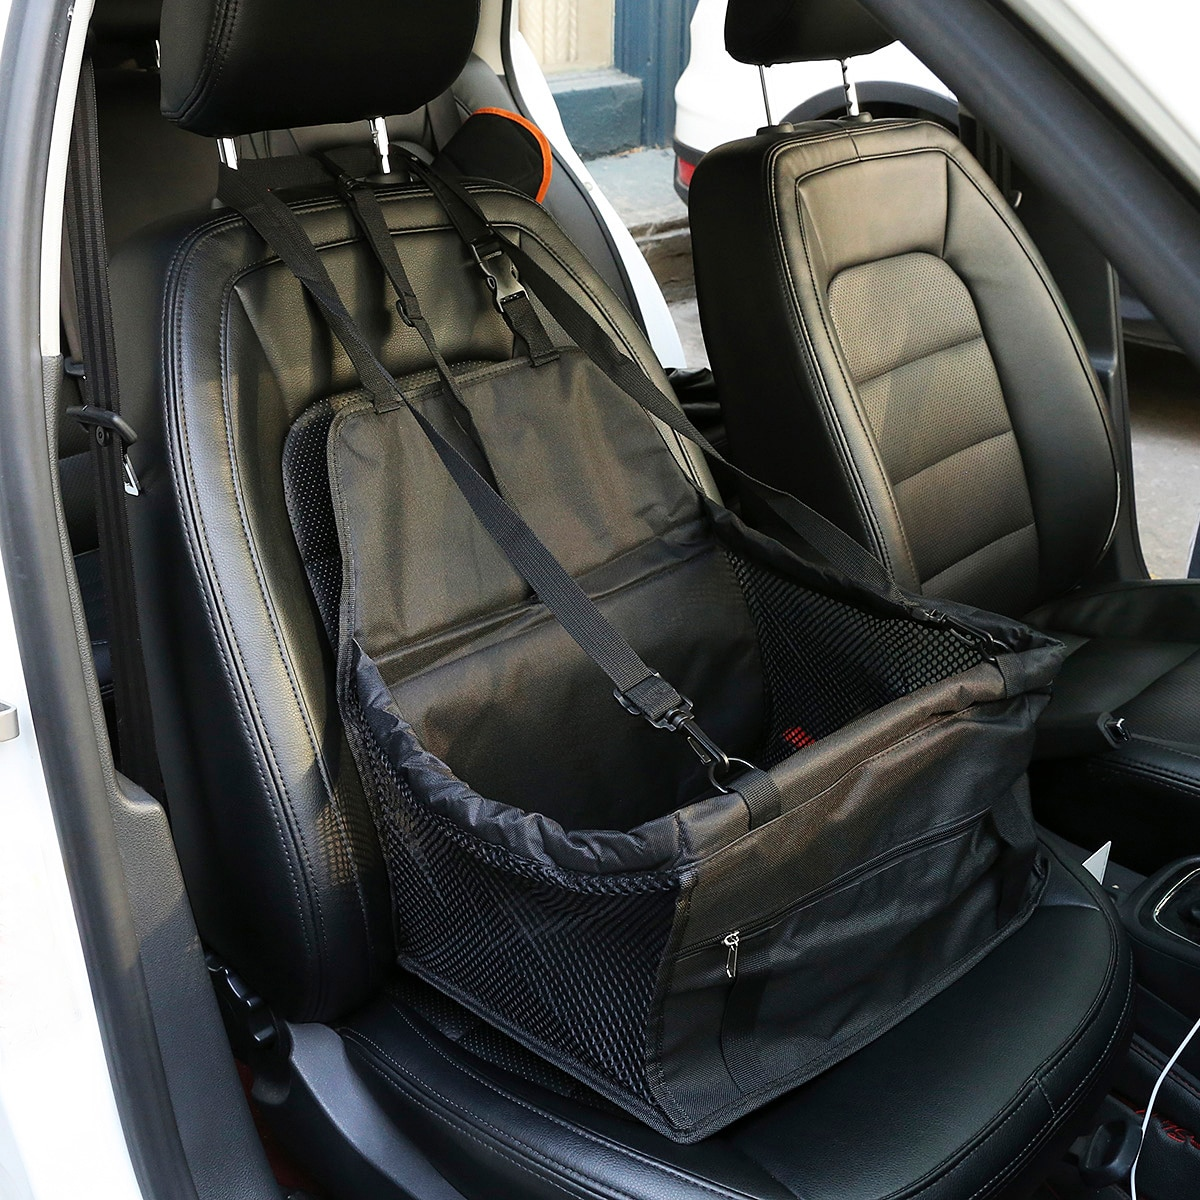 1 Stück Hundeträgerkorb auf Autositz mit Kontrast Netzstoff